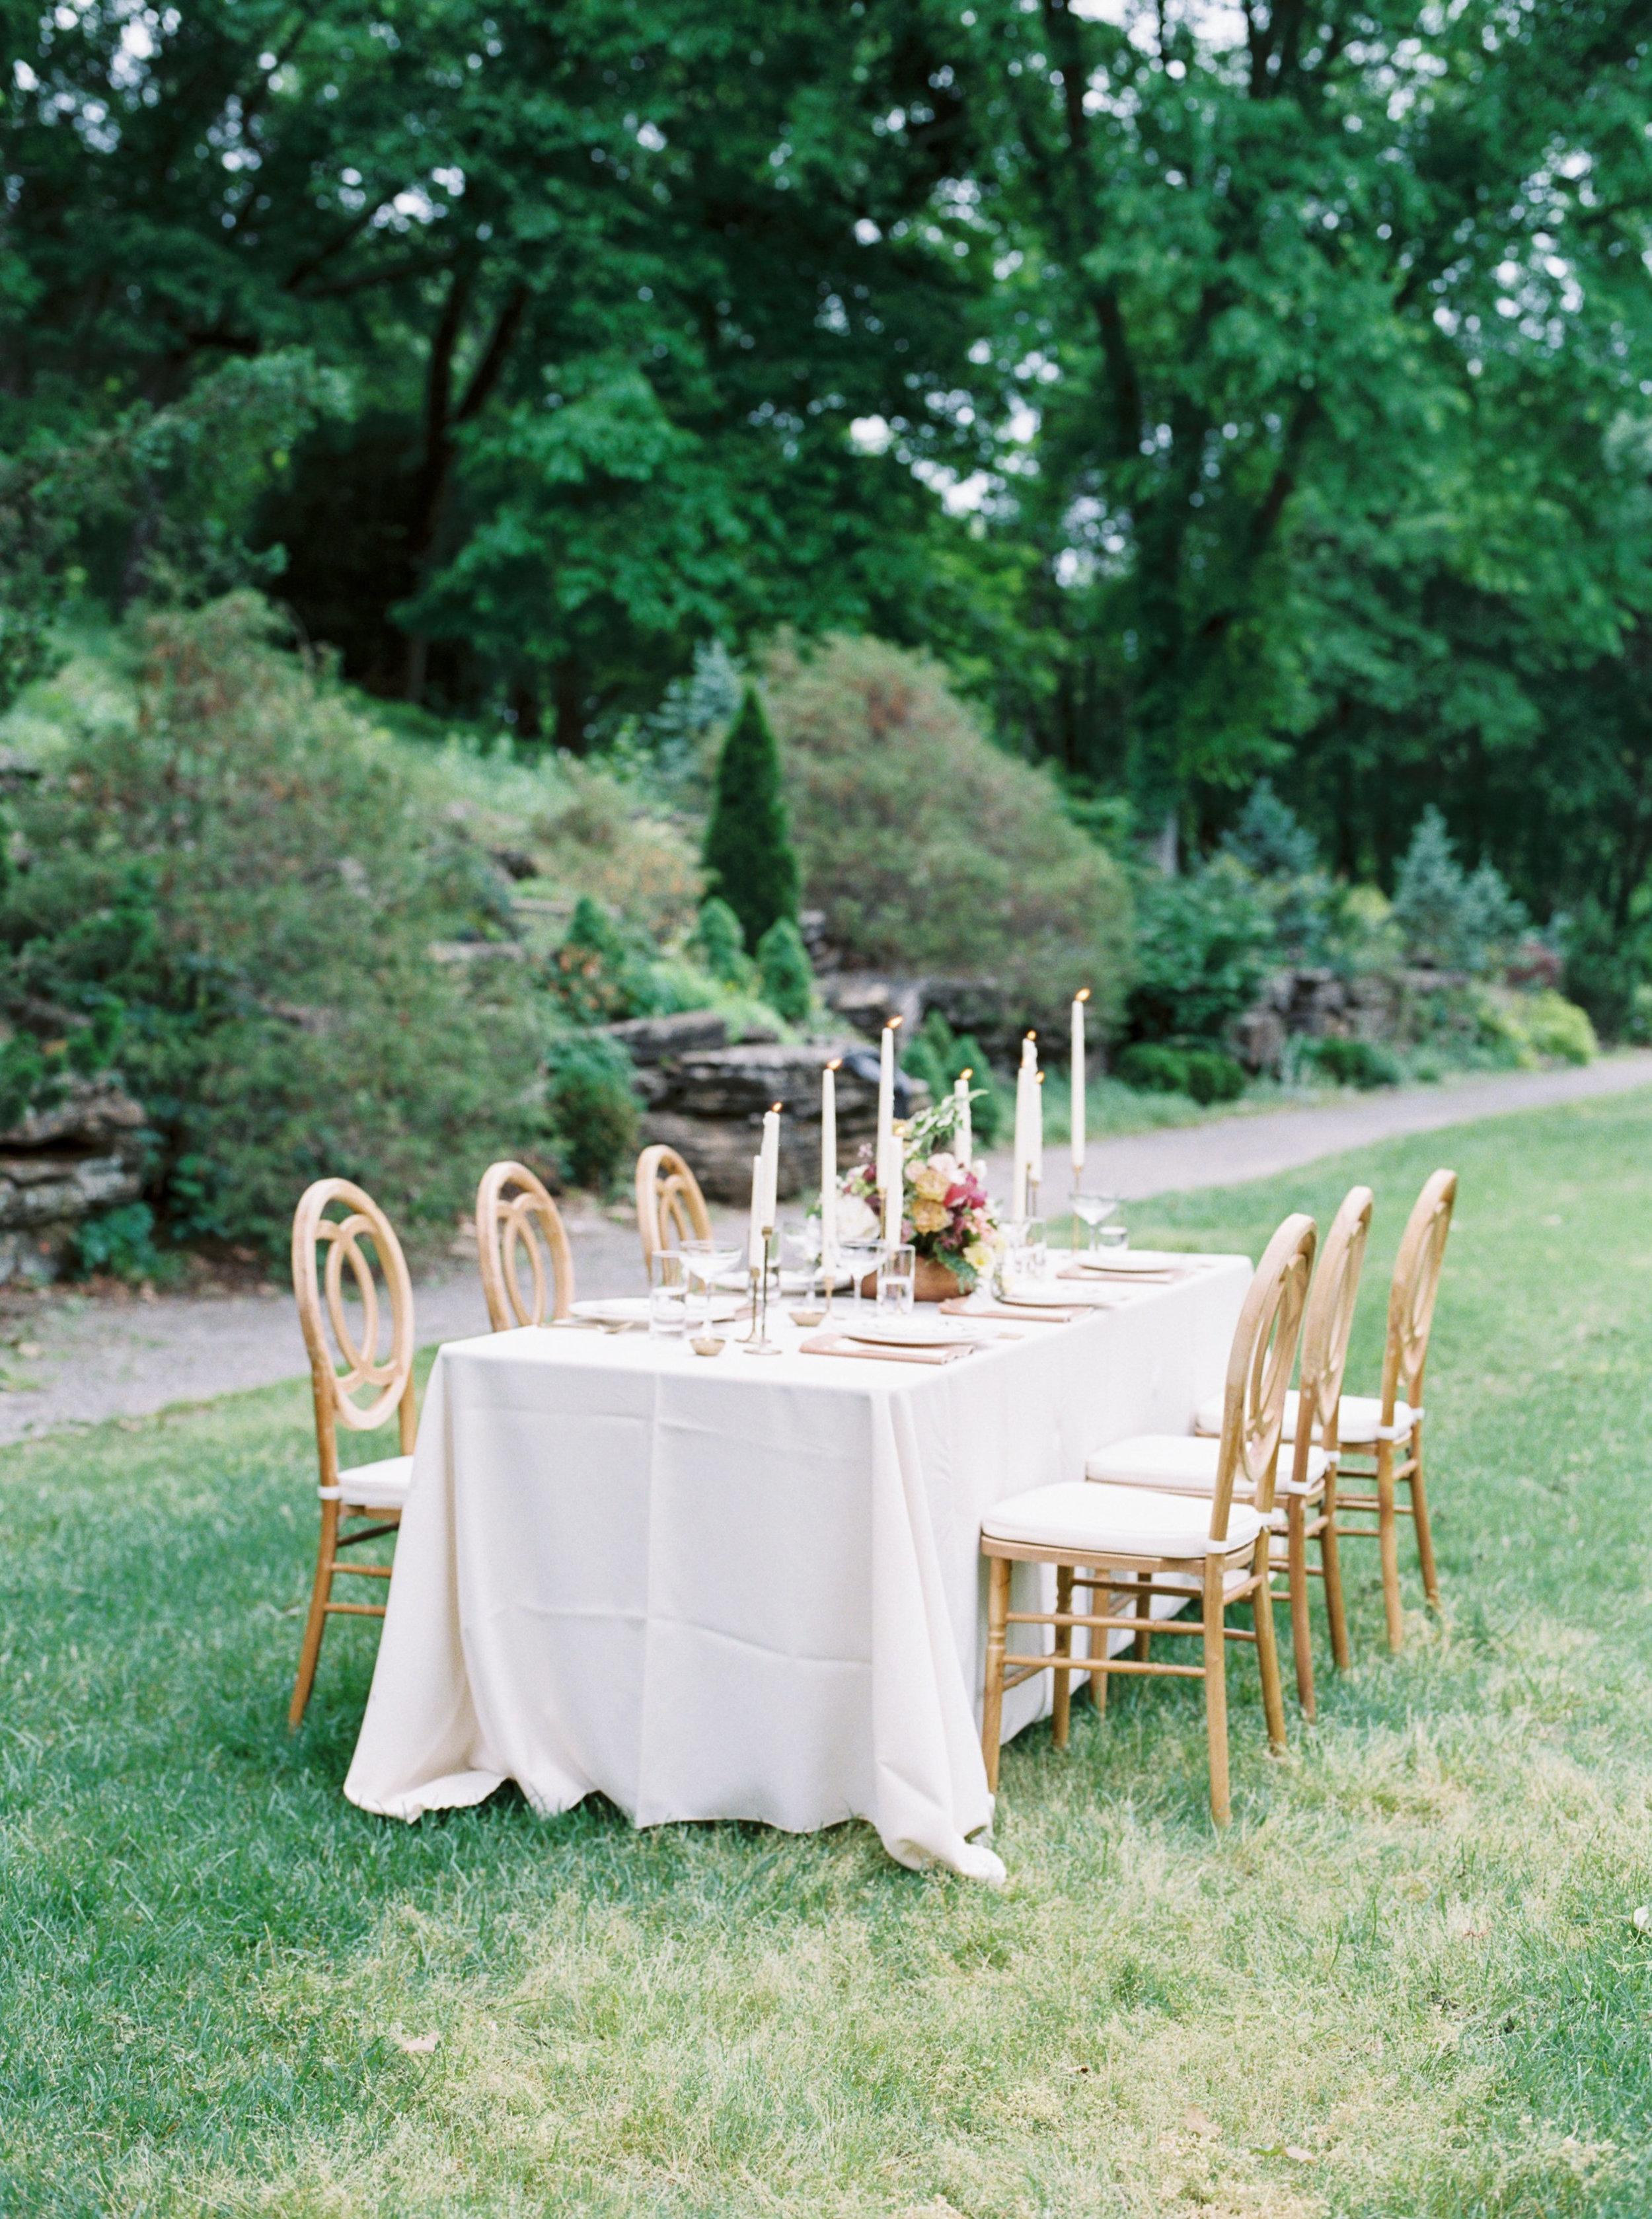 Riverwood_Mansion_Cheekwood_Bridal_Boudoir_Elopement_Nashville_Atlanta_30A_Fallen_Photography-135.jpg